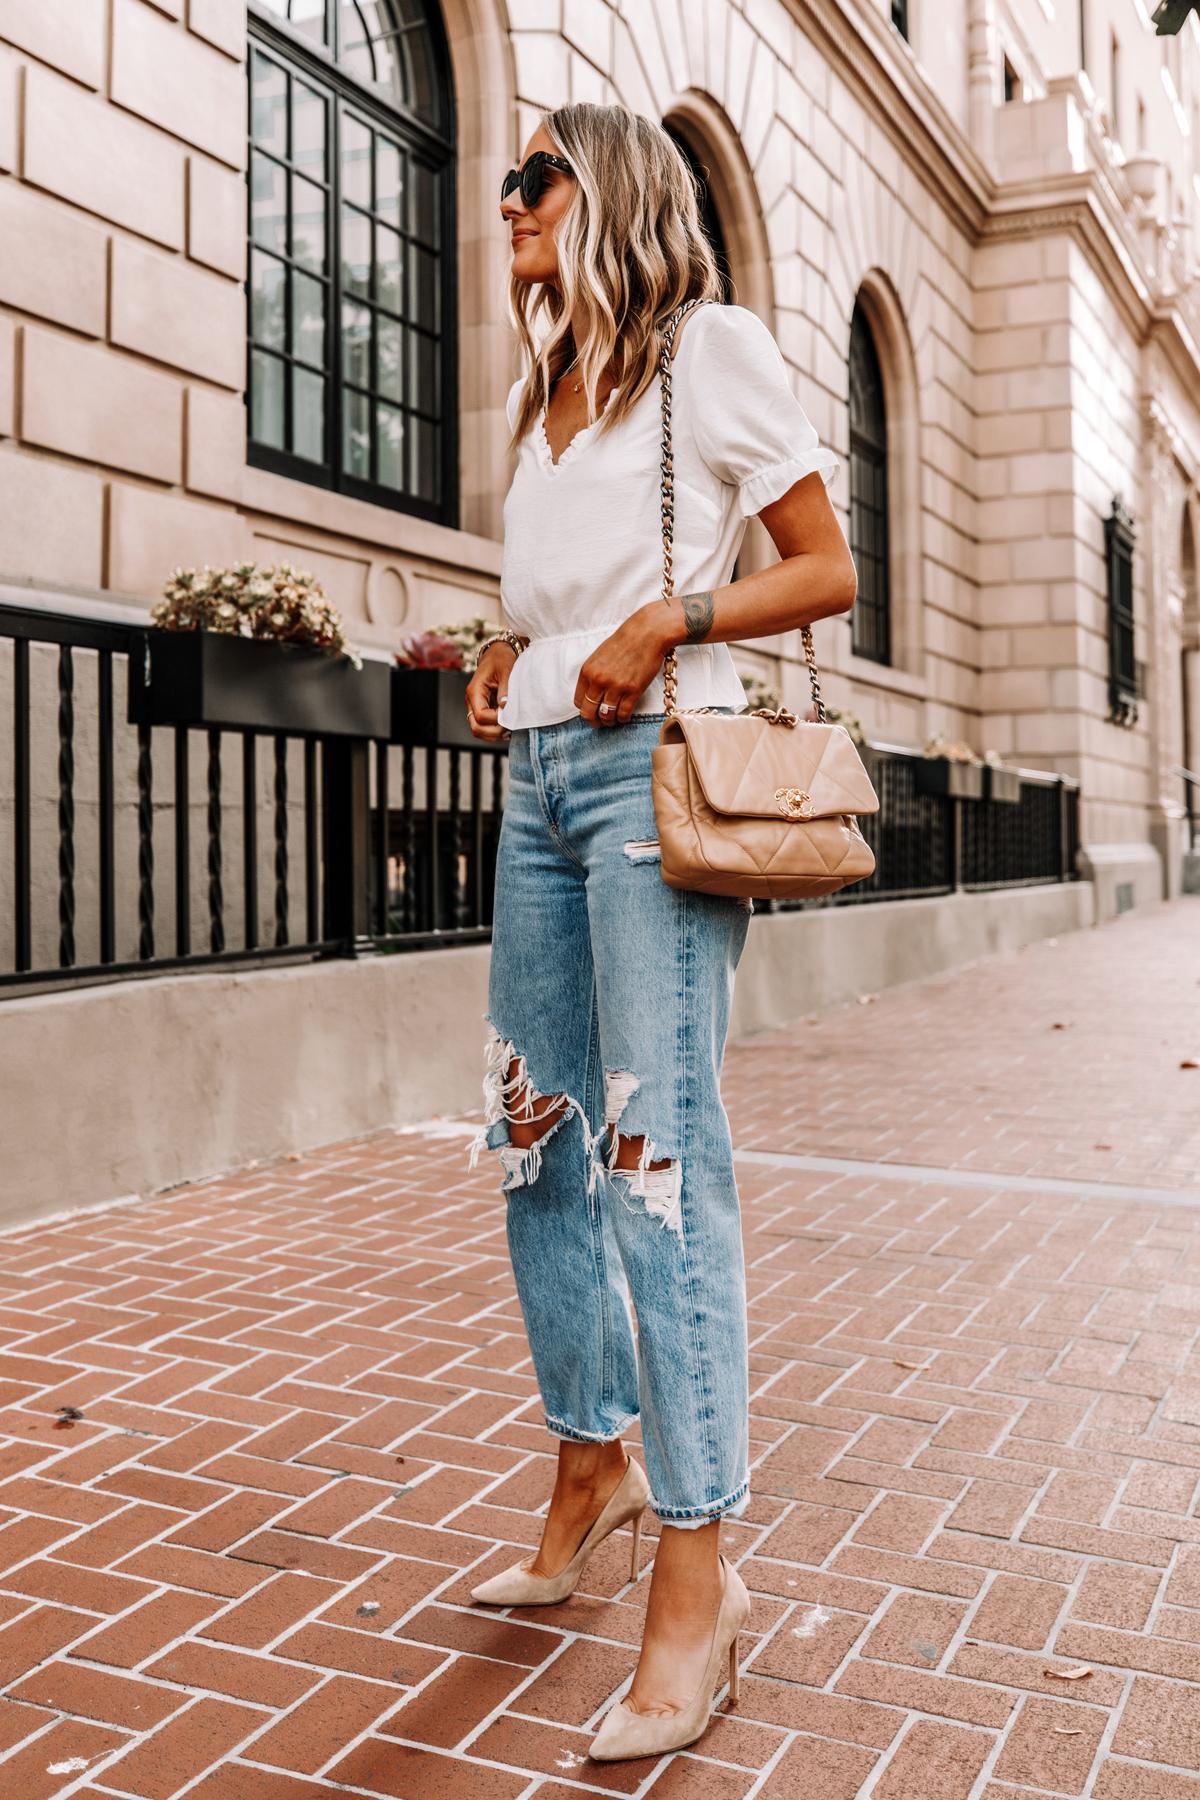 Fashion Jackson Wearing Topshop White Peplum Top AGOLDE Ripped 90s Jeans Nude Pumps Chanel 19 Beige Handbag